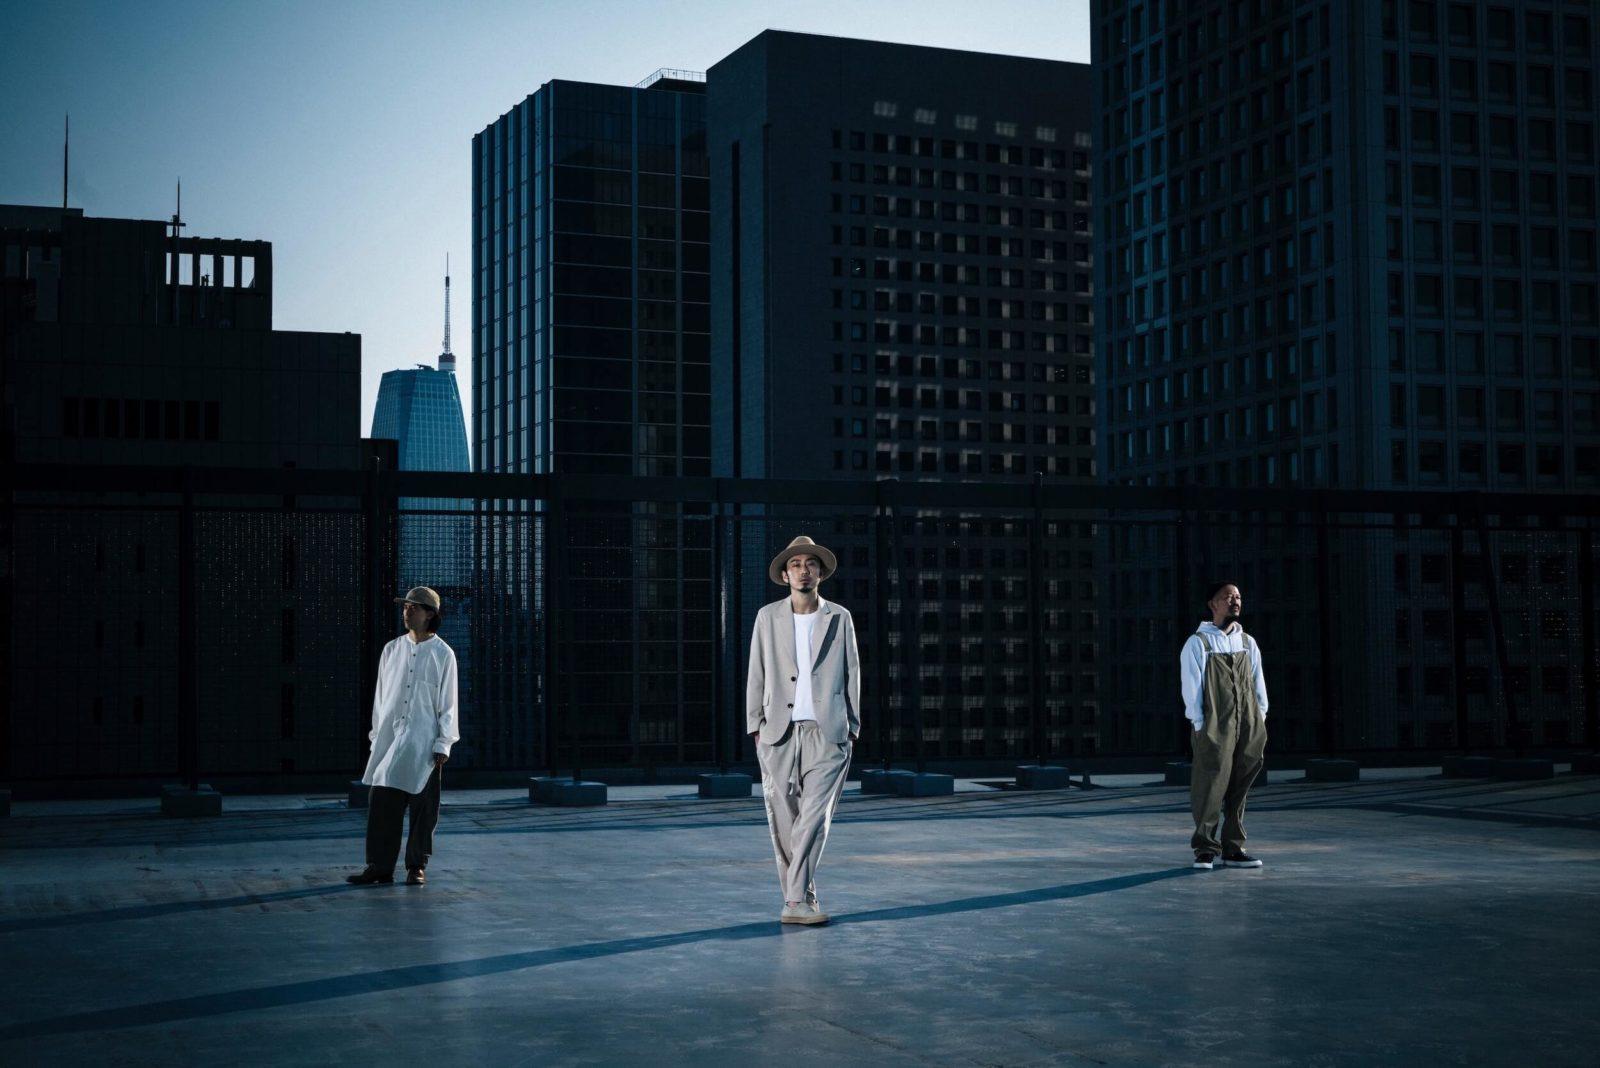 ACIDMAN、ニューシングル『灰色の街』ジャケット写真公開サムネイル画像!